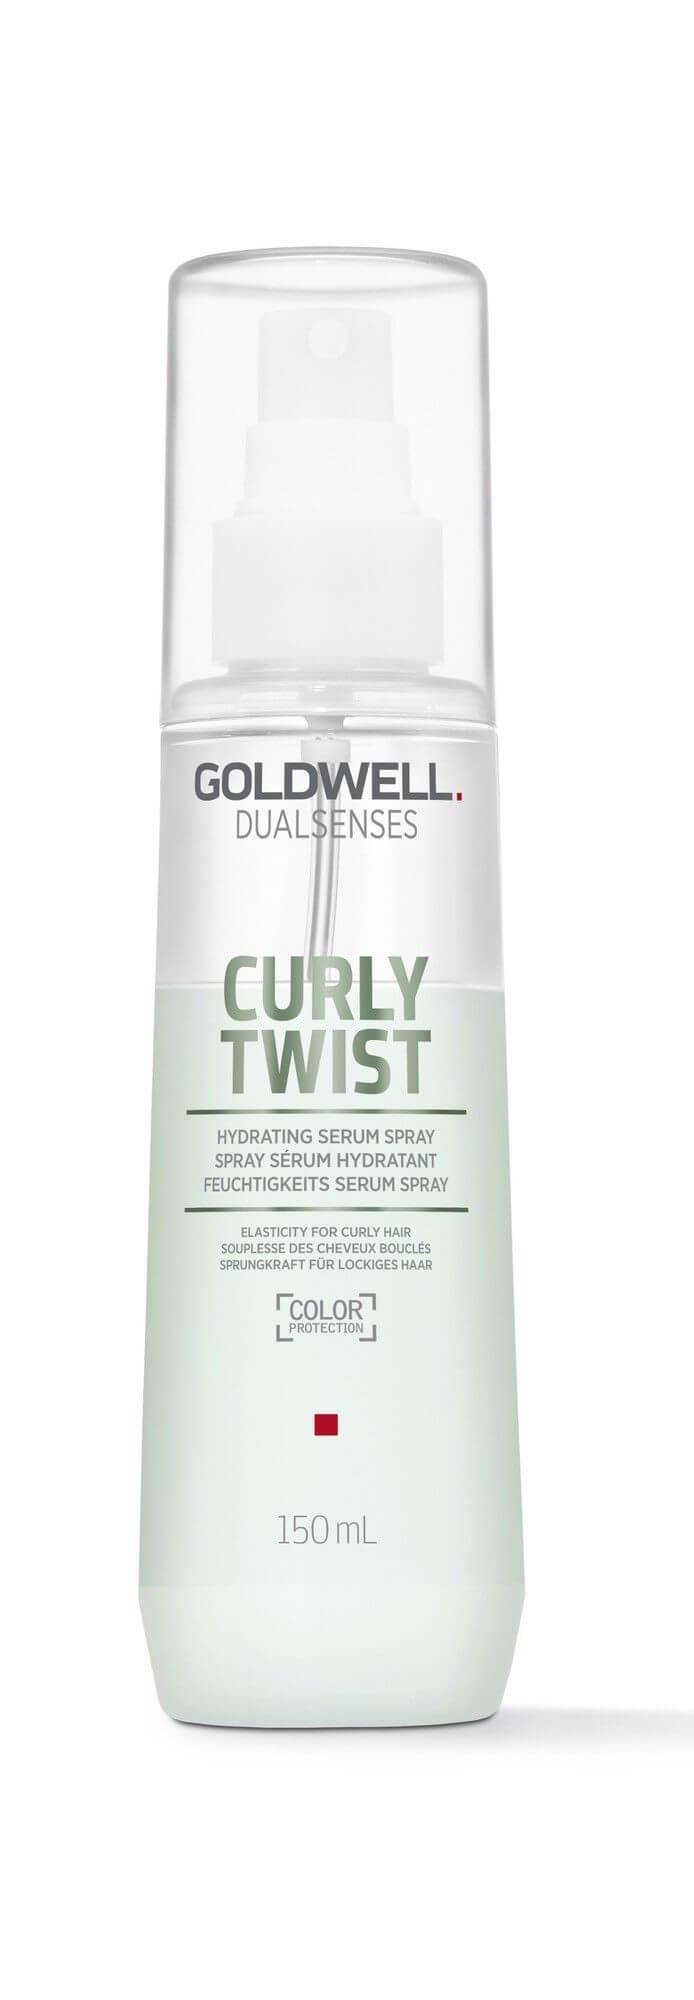 Dualsenses Curls & Waves Hydrating Serum Spray.